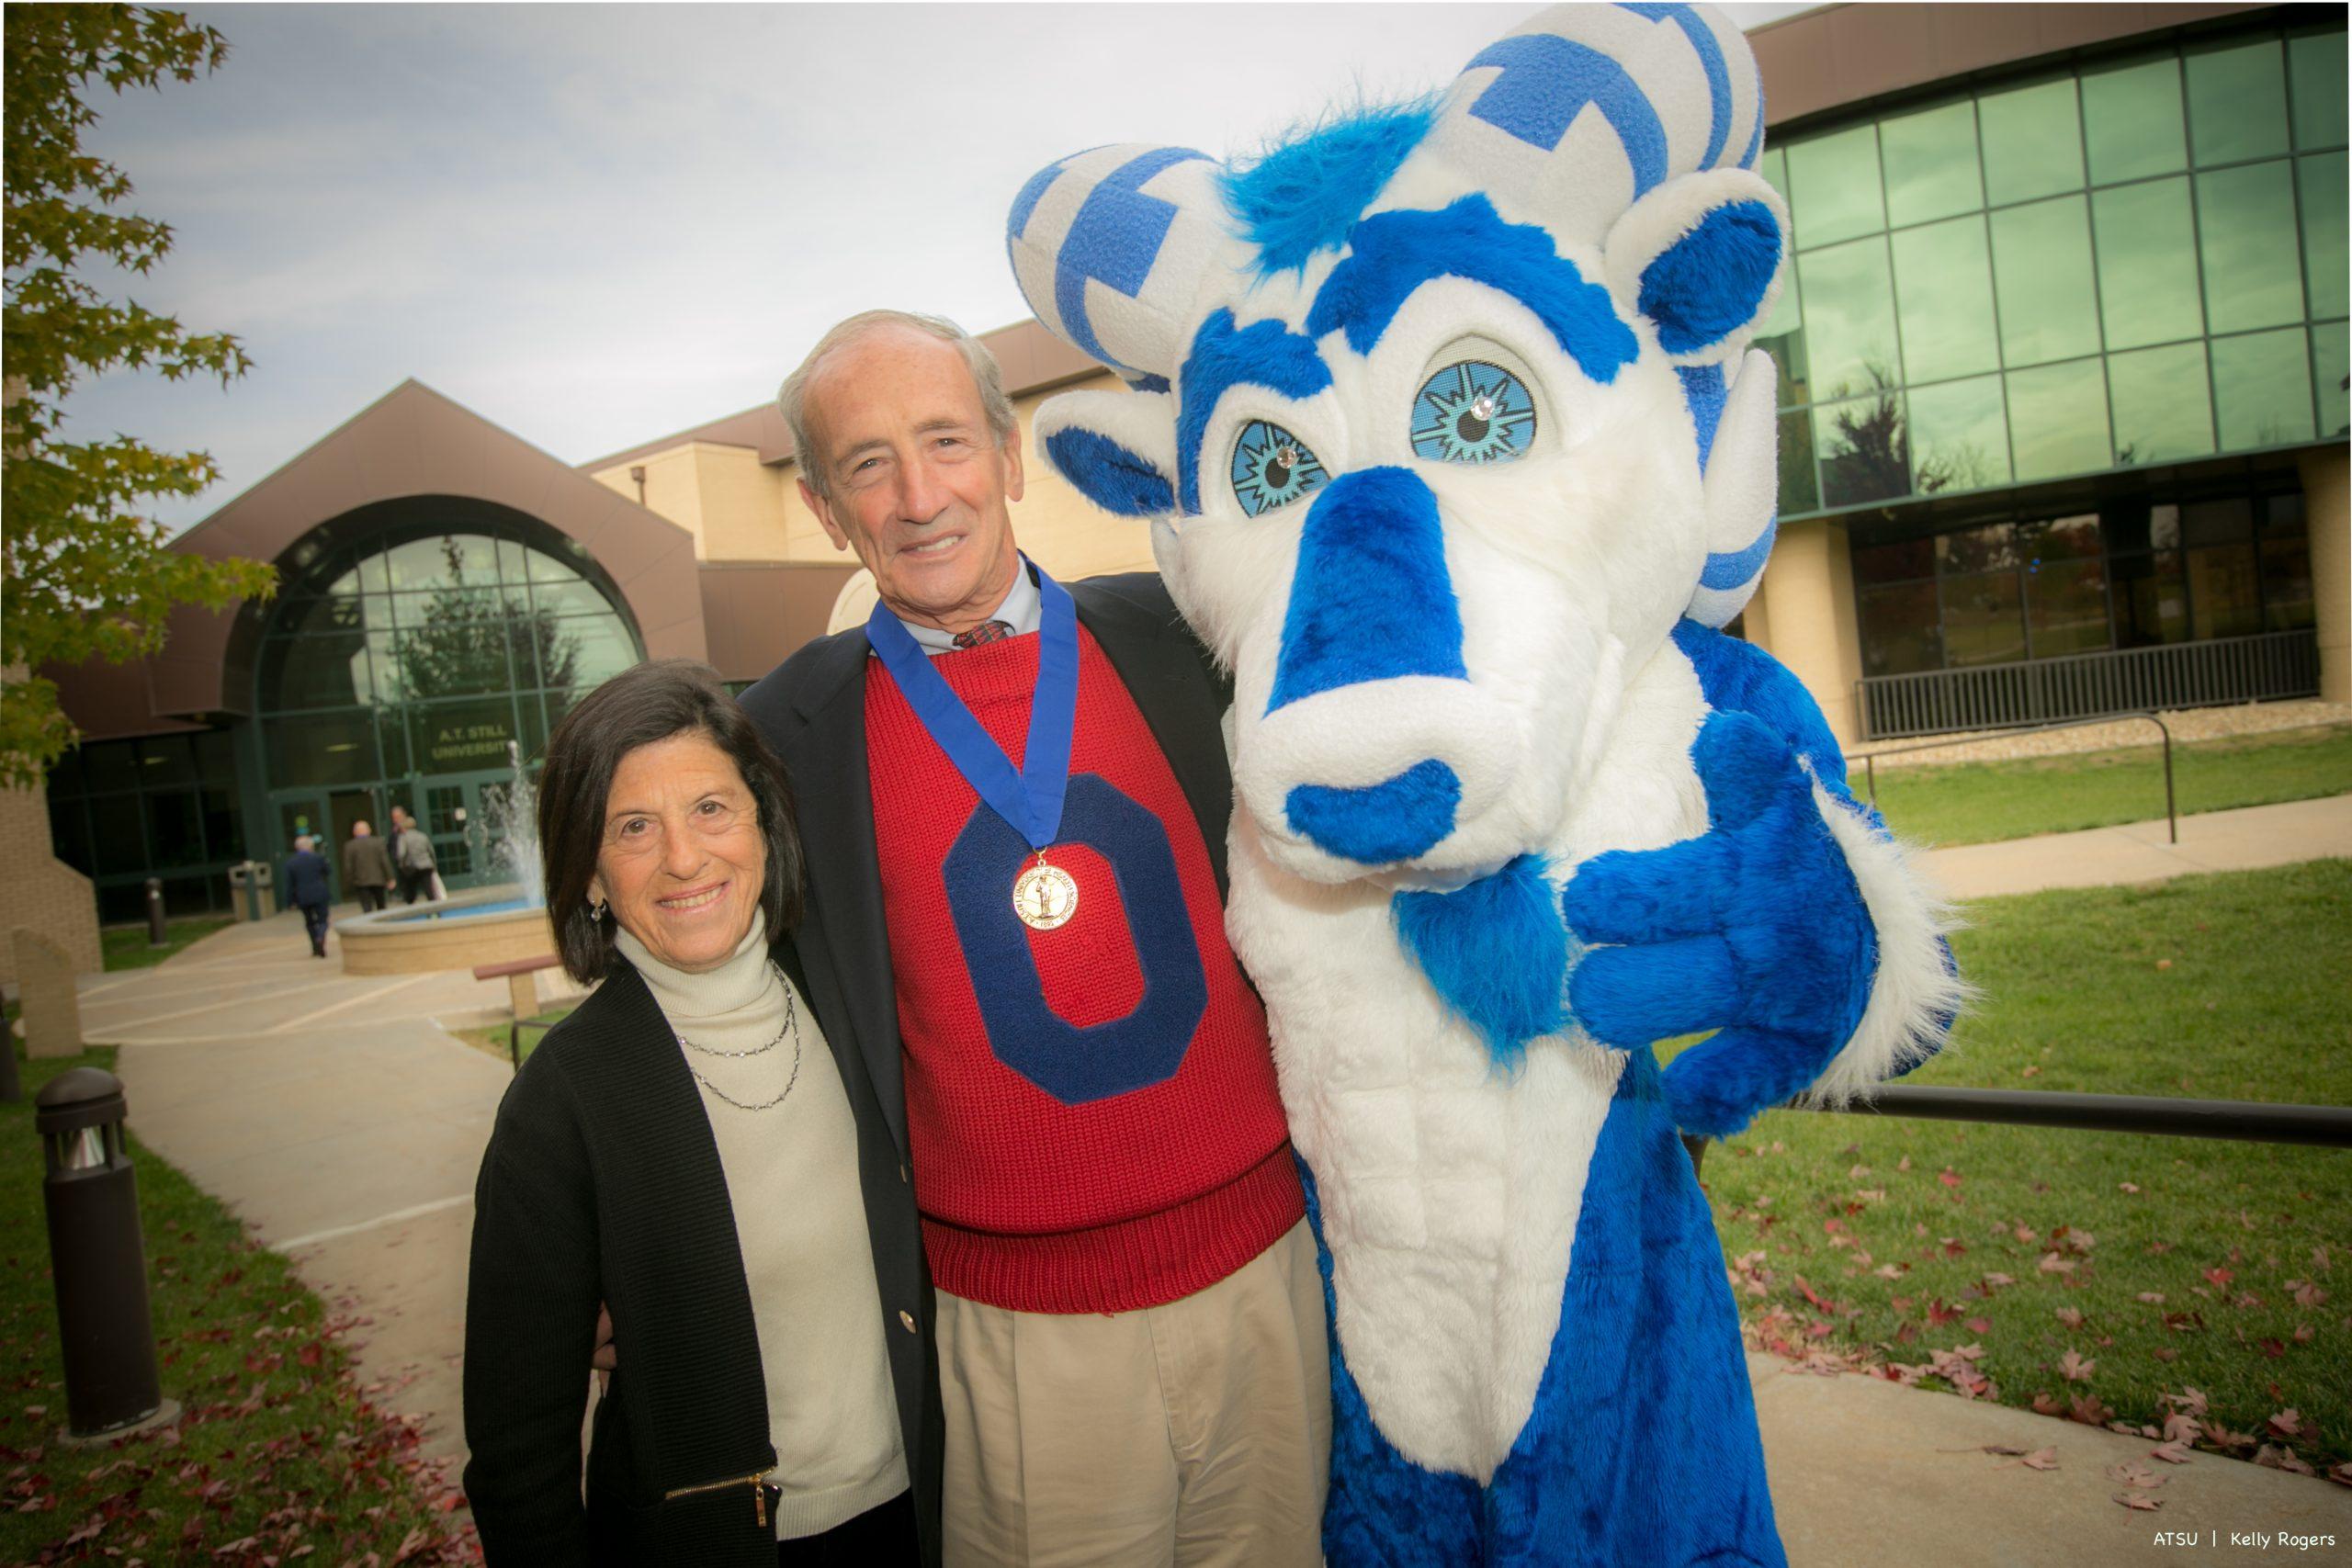 man & woman posing with Bucky mascot